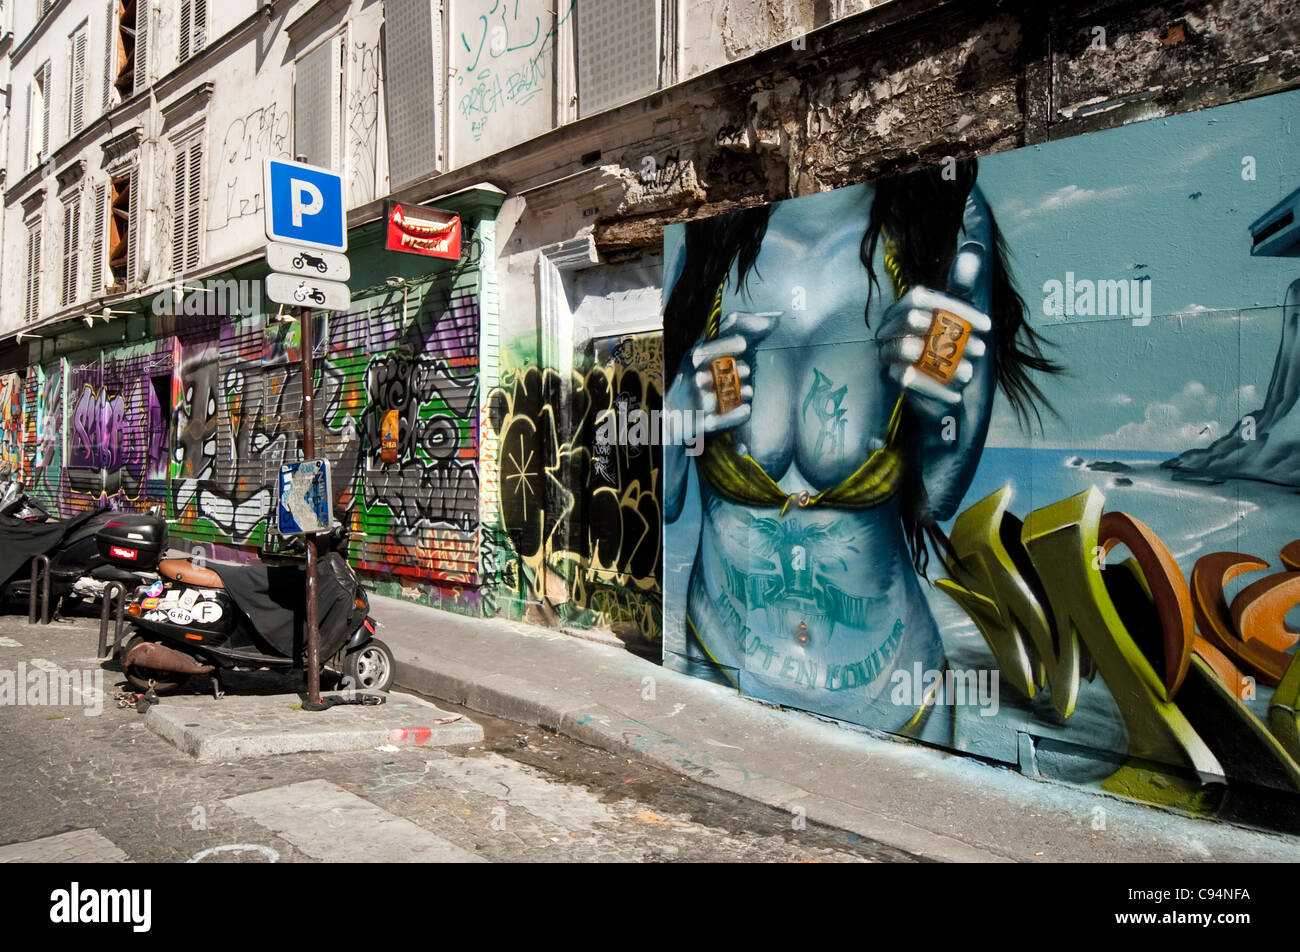 street art graffitti monmartre paris - Stock Image